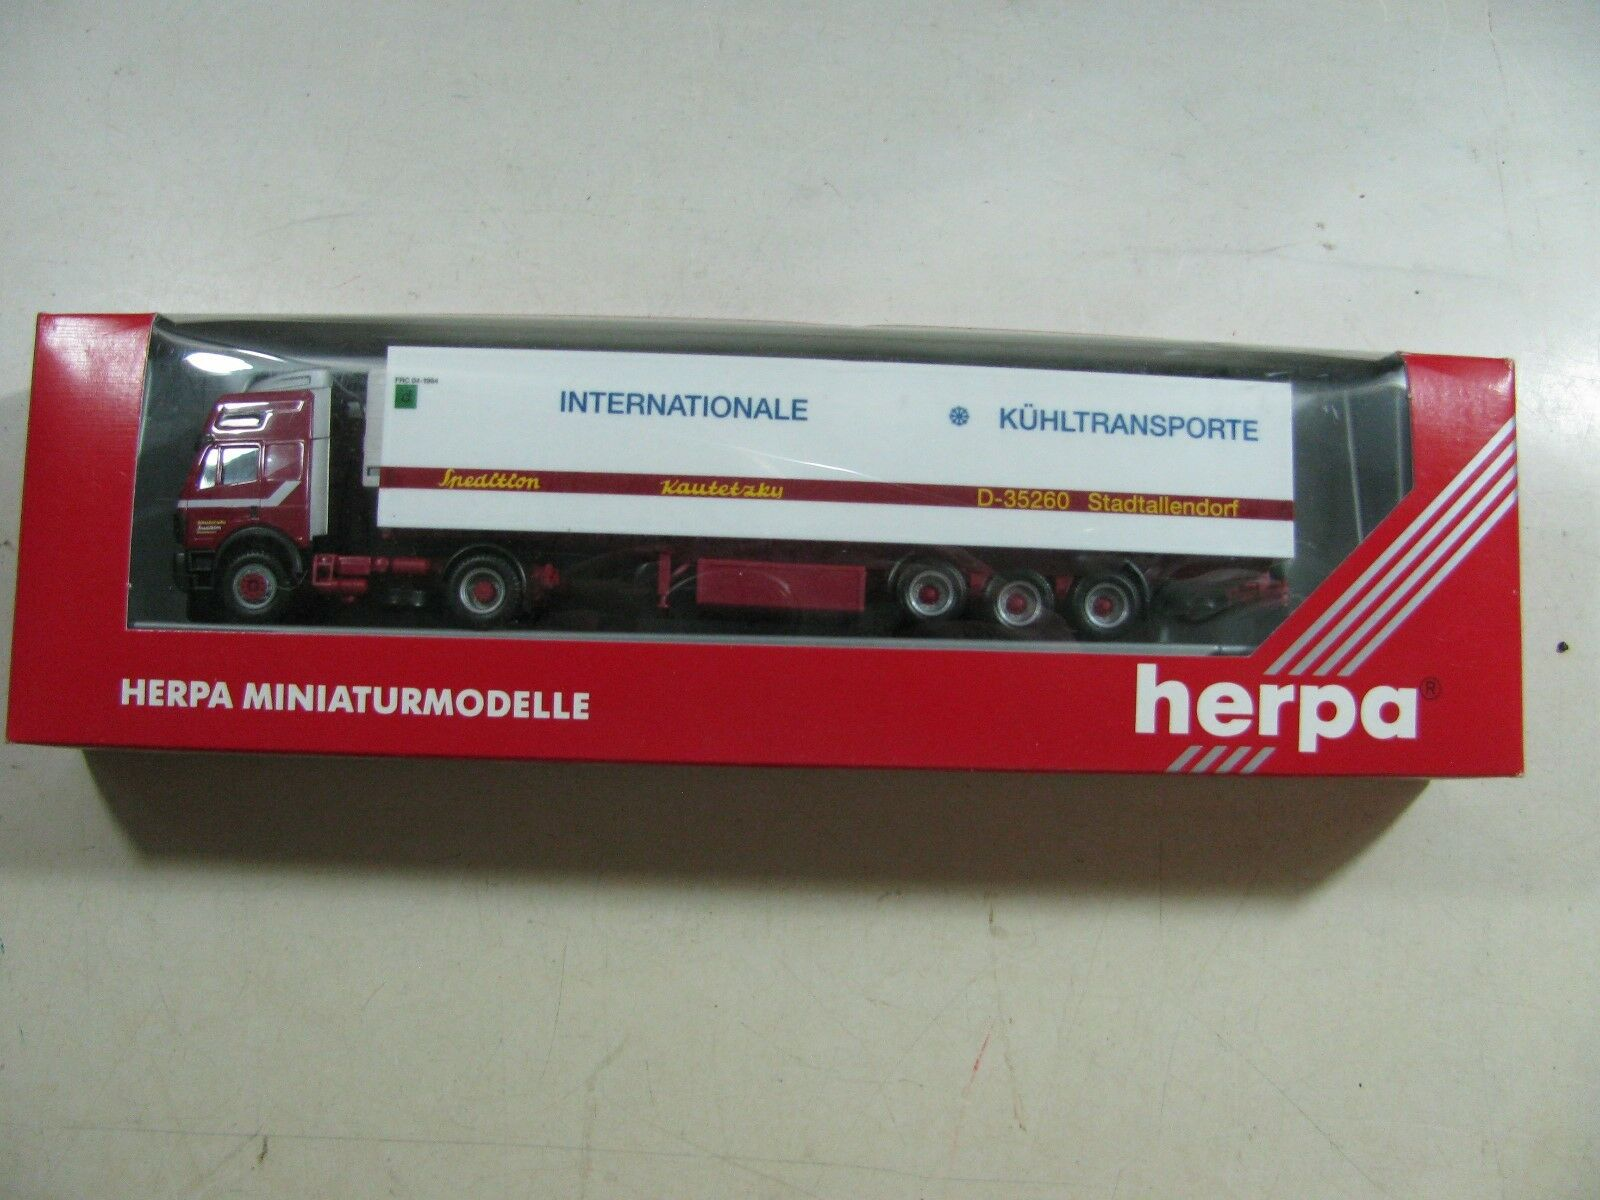 423   Herpa h0 camion kautetzky transporteur-internationale Isolation